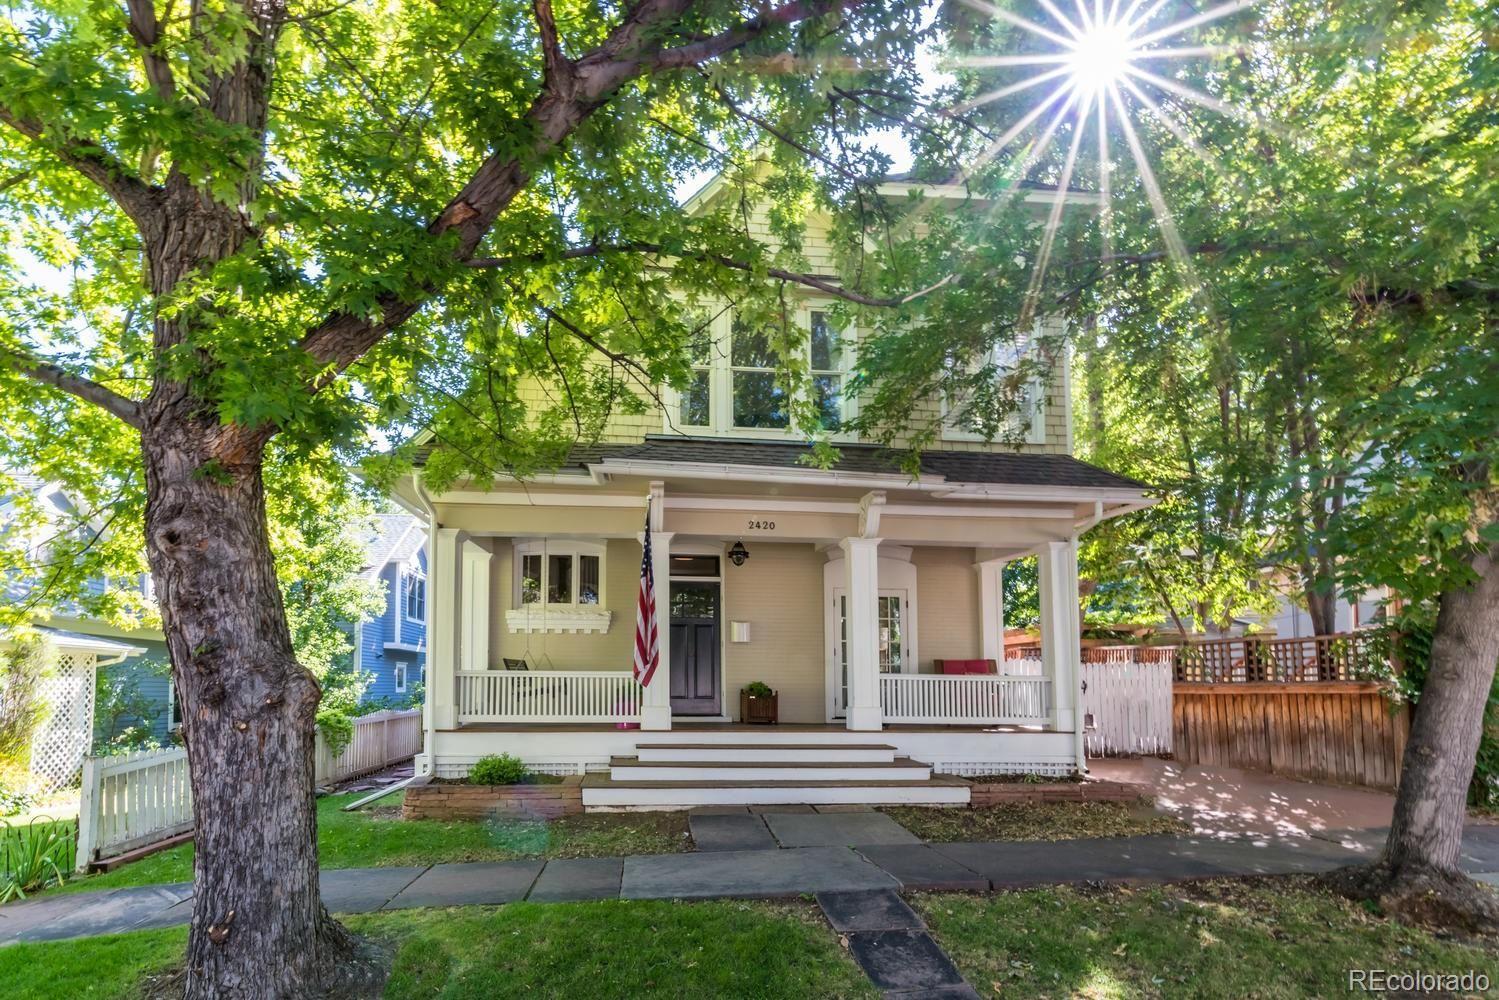 2420 10th Street, Boulder, CO 80304 - #: 7711469